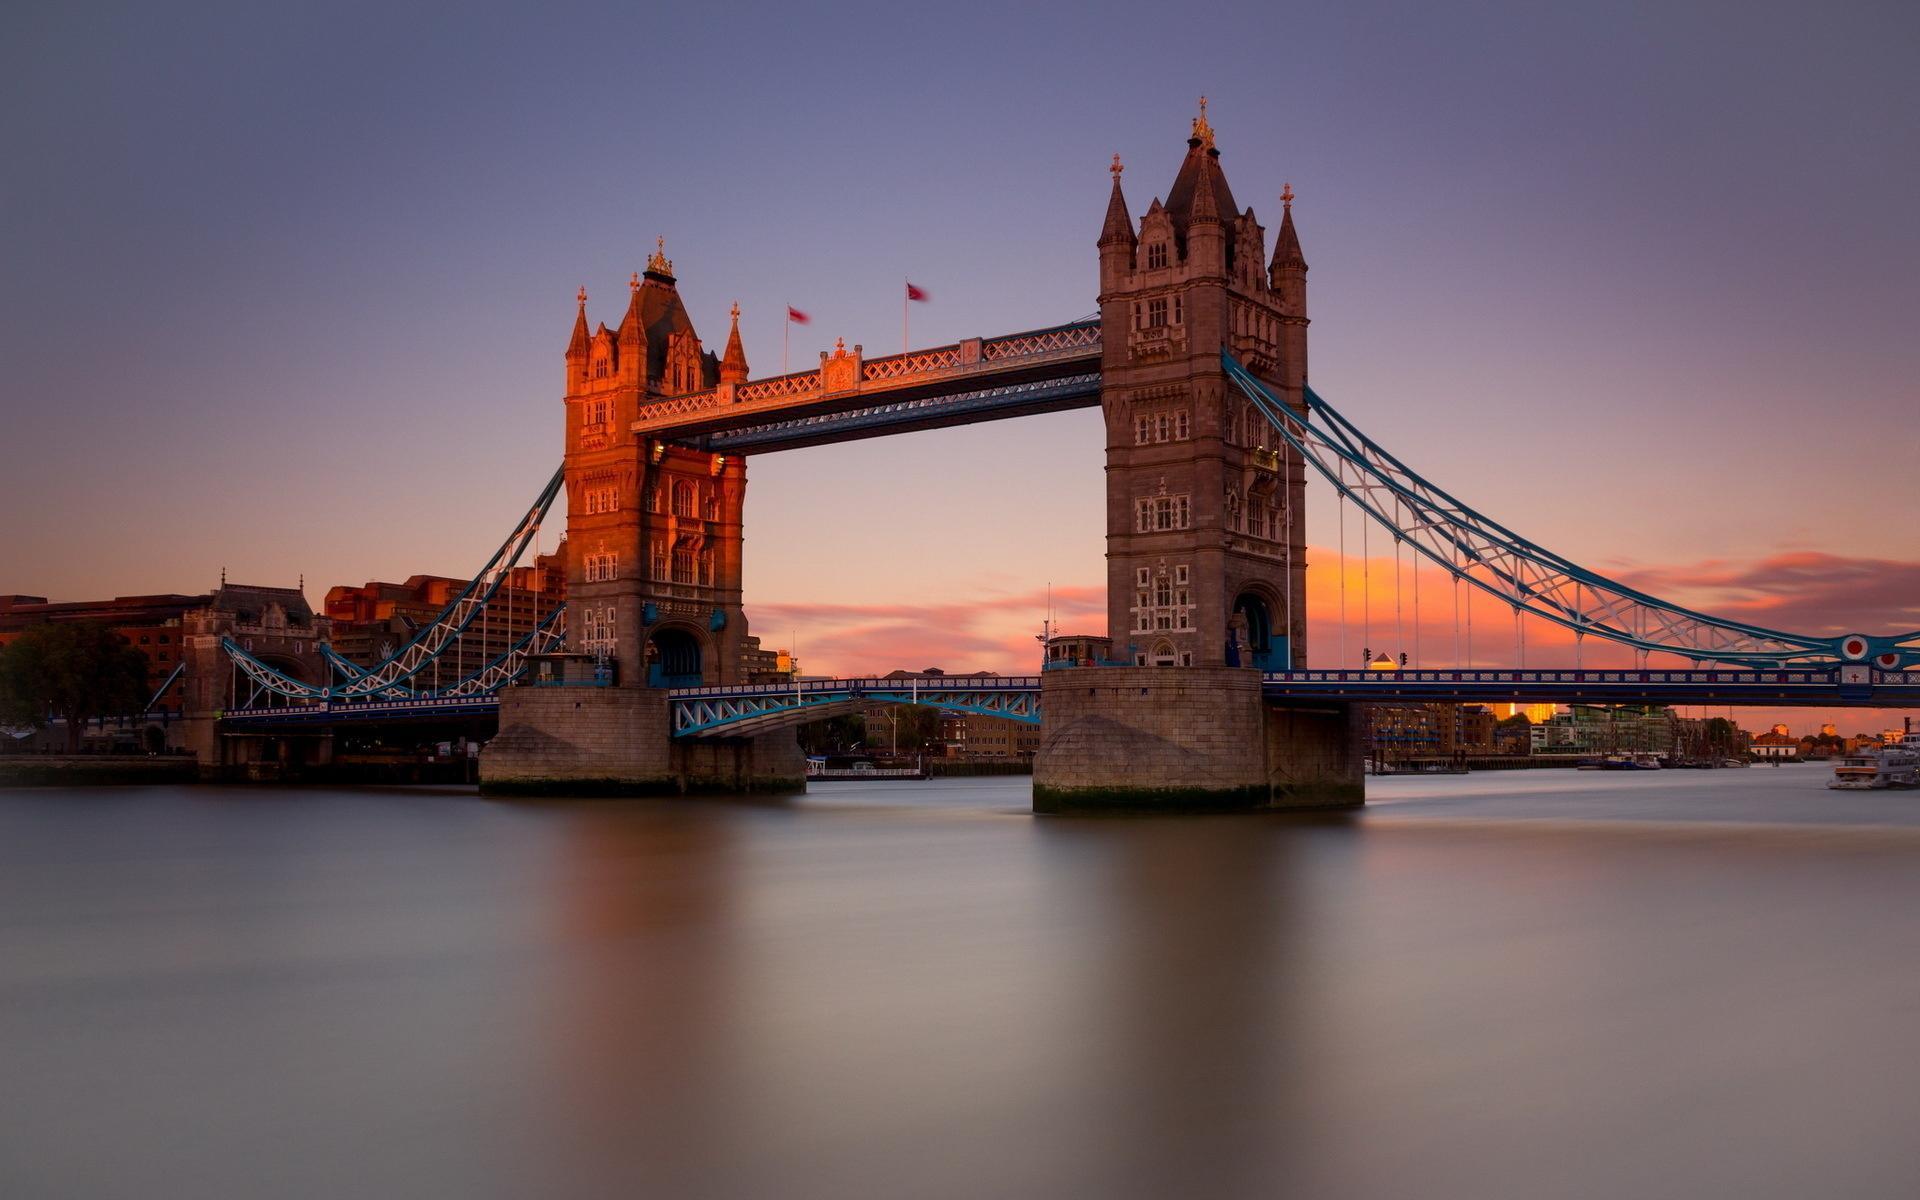 Tower Bridge Wallpaper Hd Download